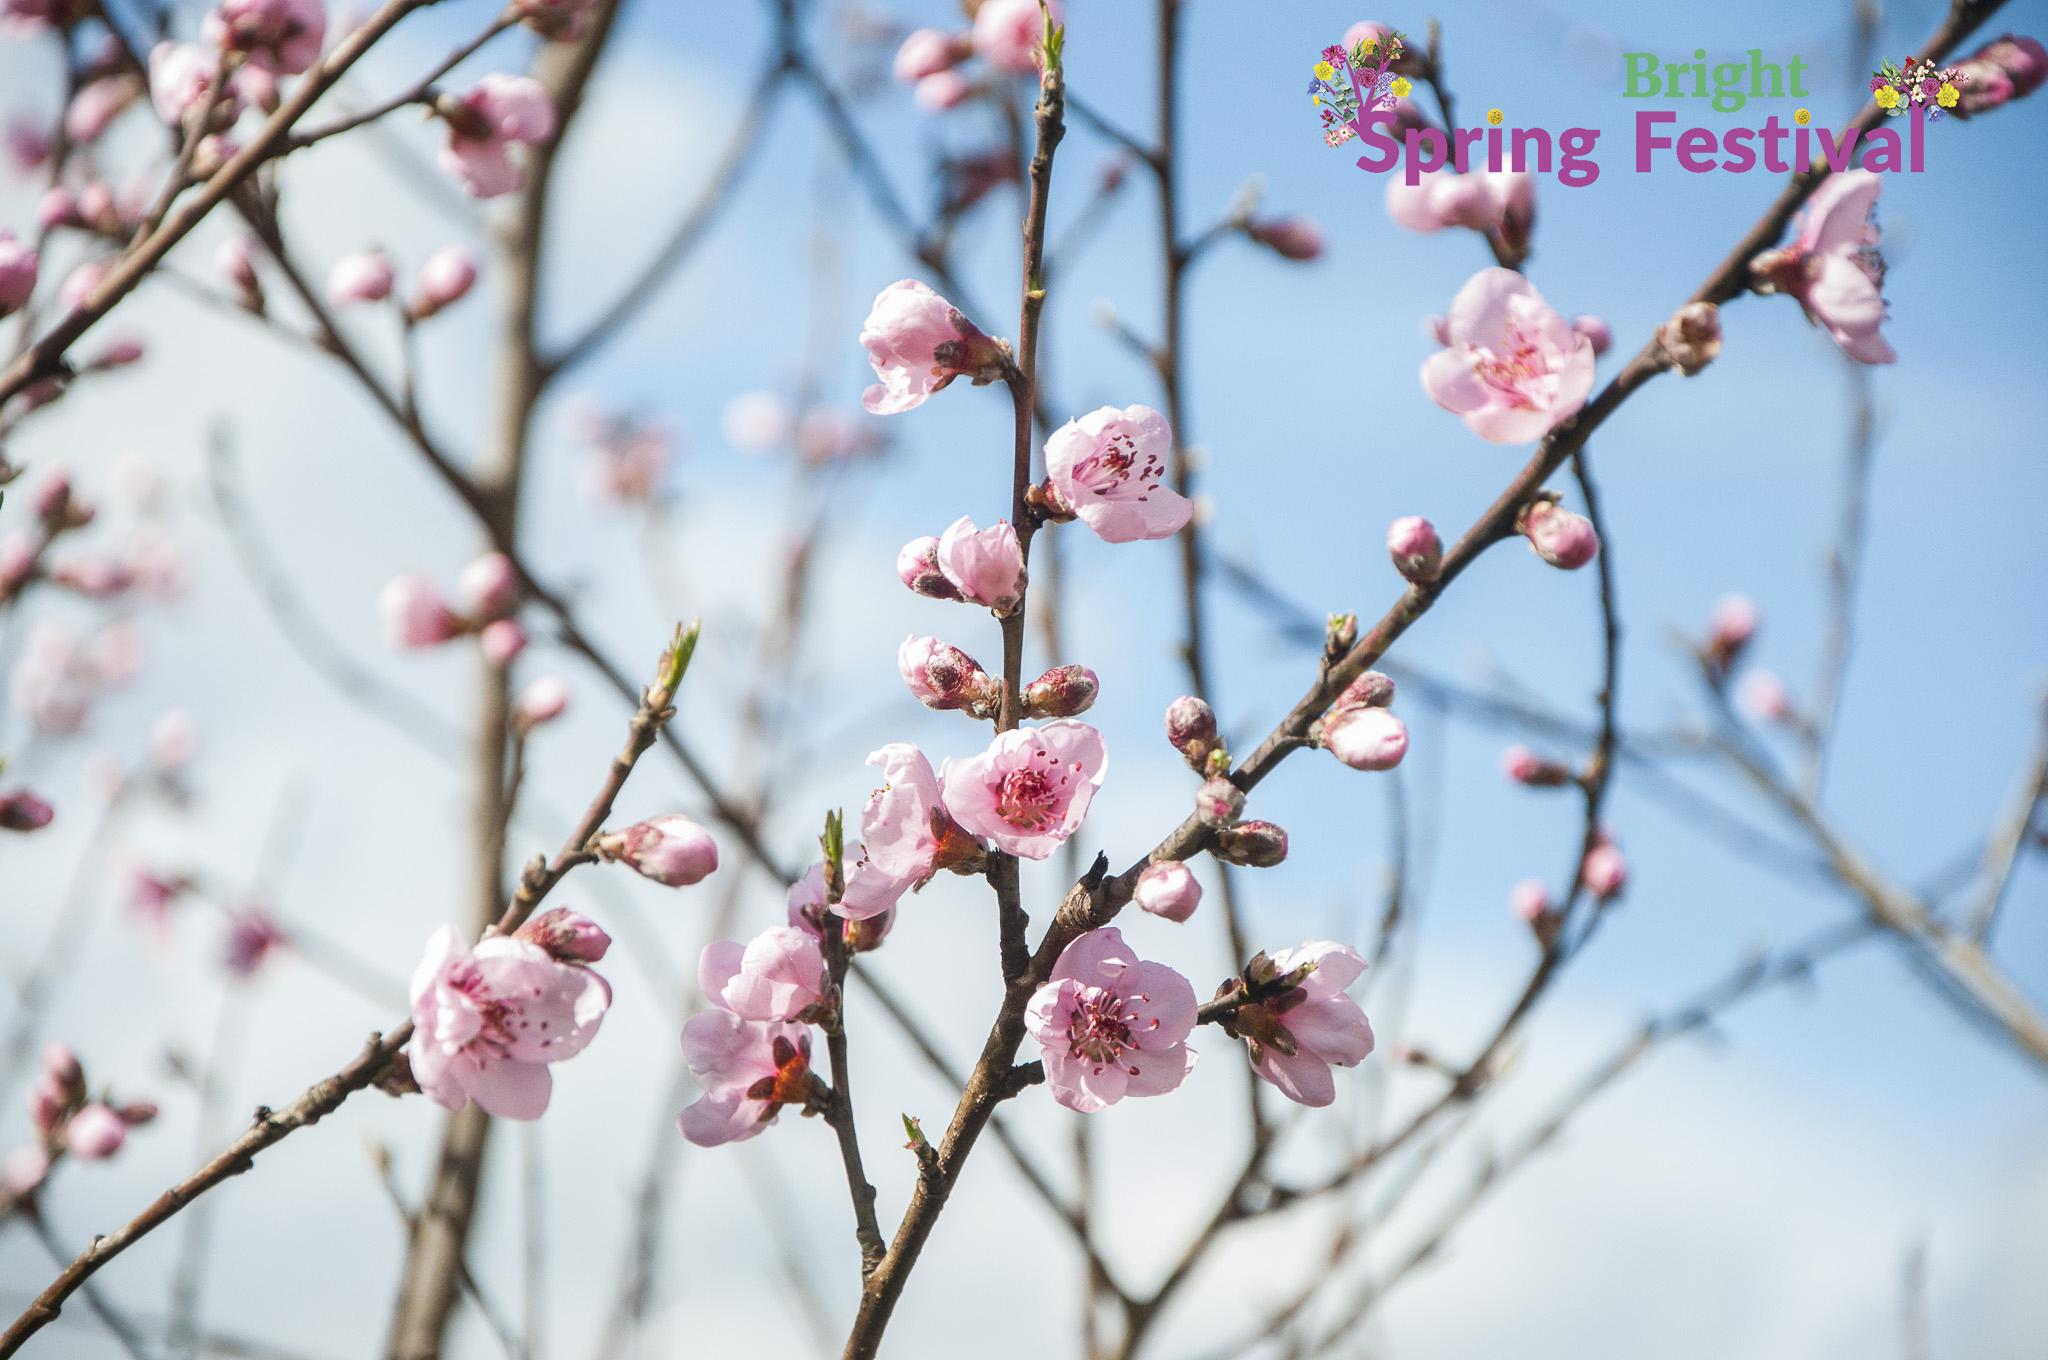 Brigh Spring Festival 1509 - 010